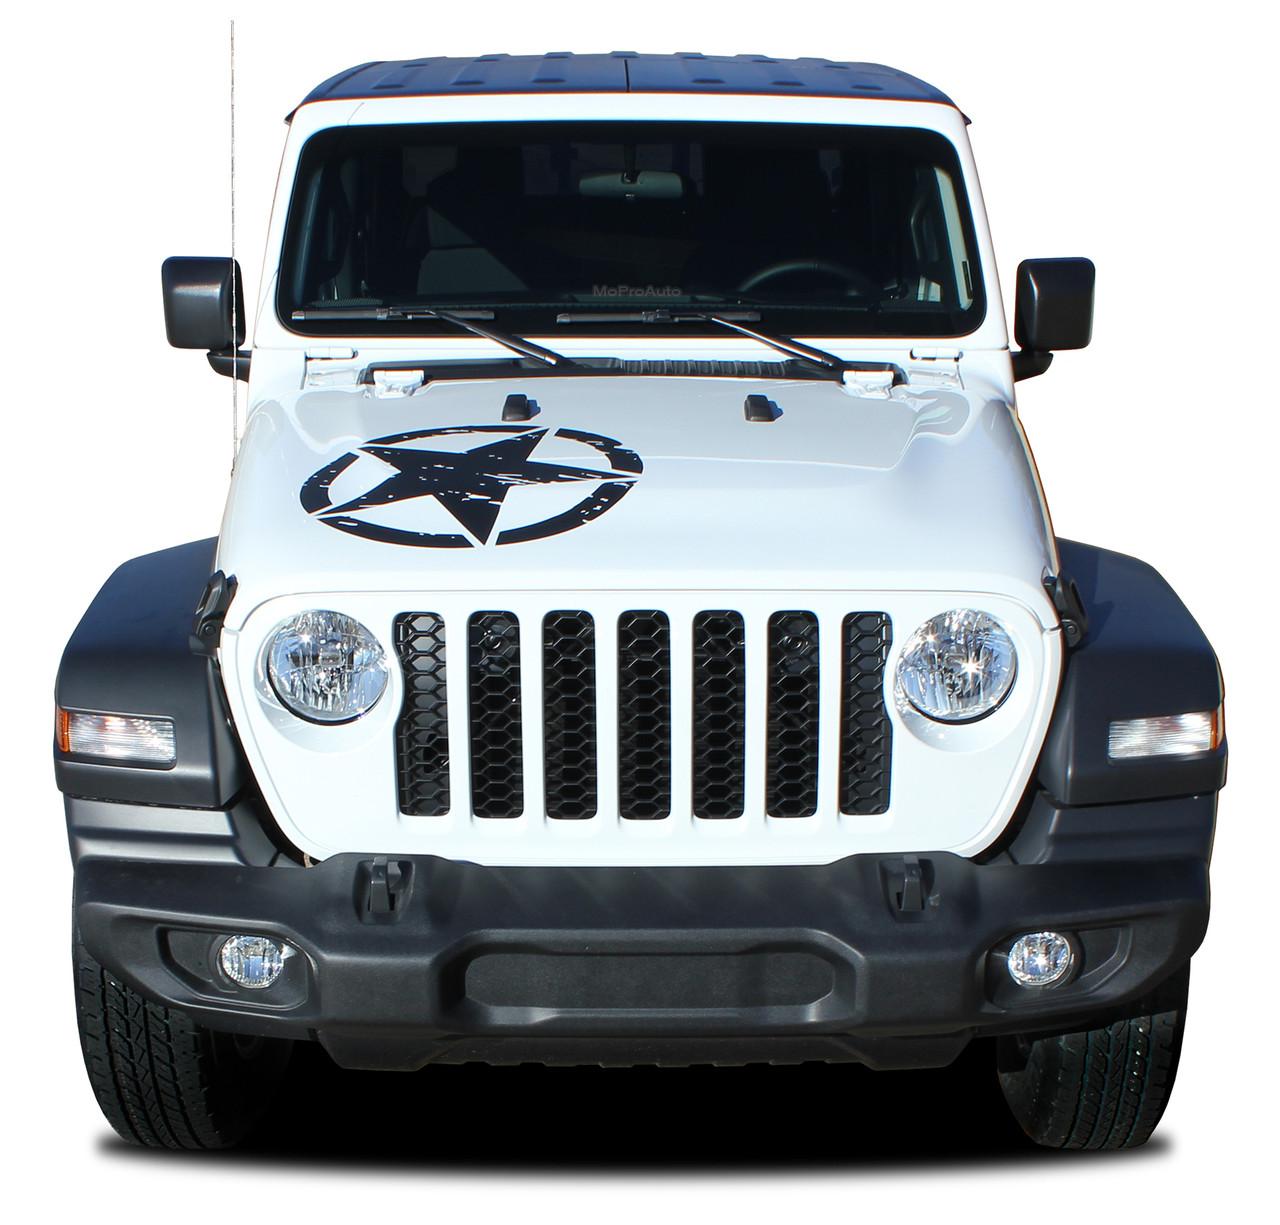 legend star hood  jeep gladiator hood graphics with